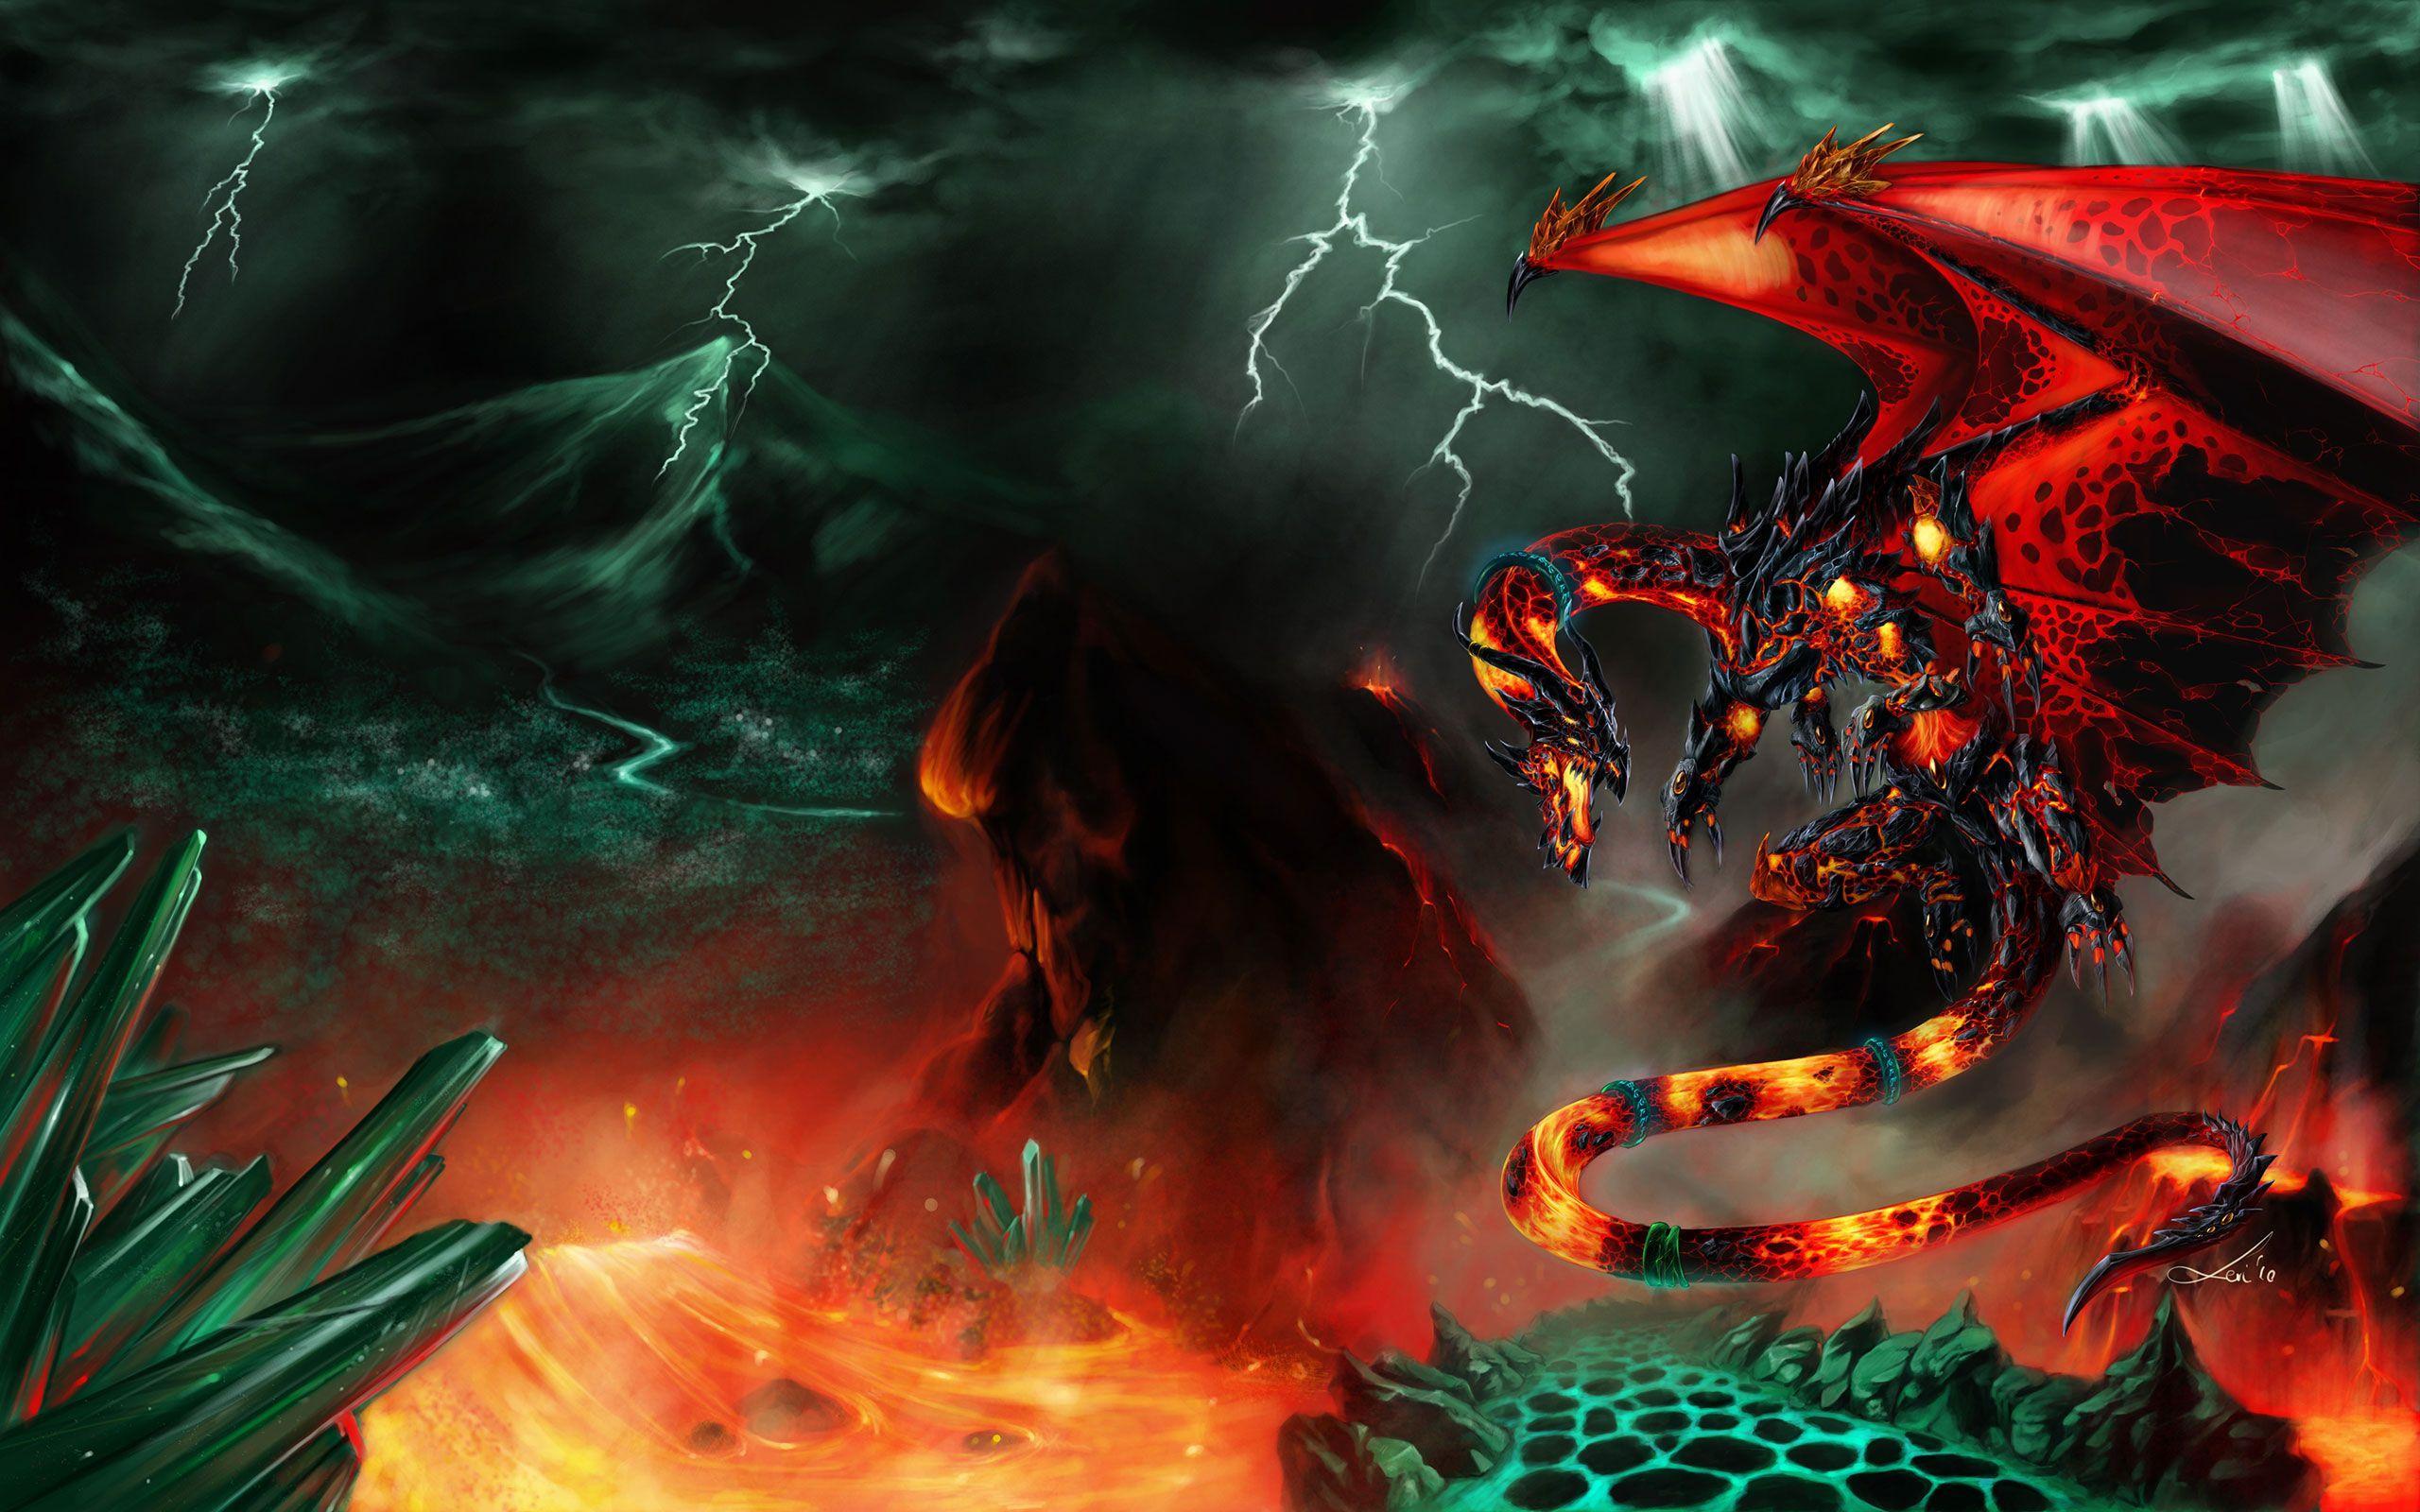 Elemental Dragon Wallpapers - Top Free Elemental Dragon Backgrounds